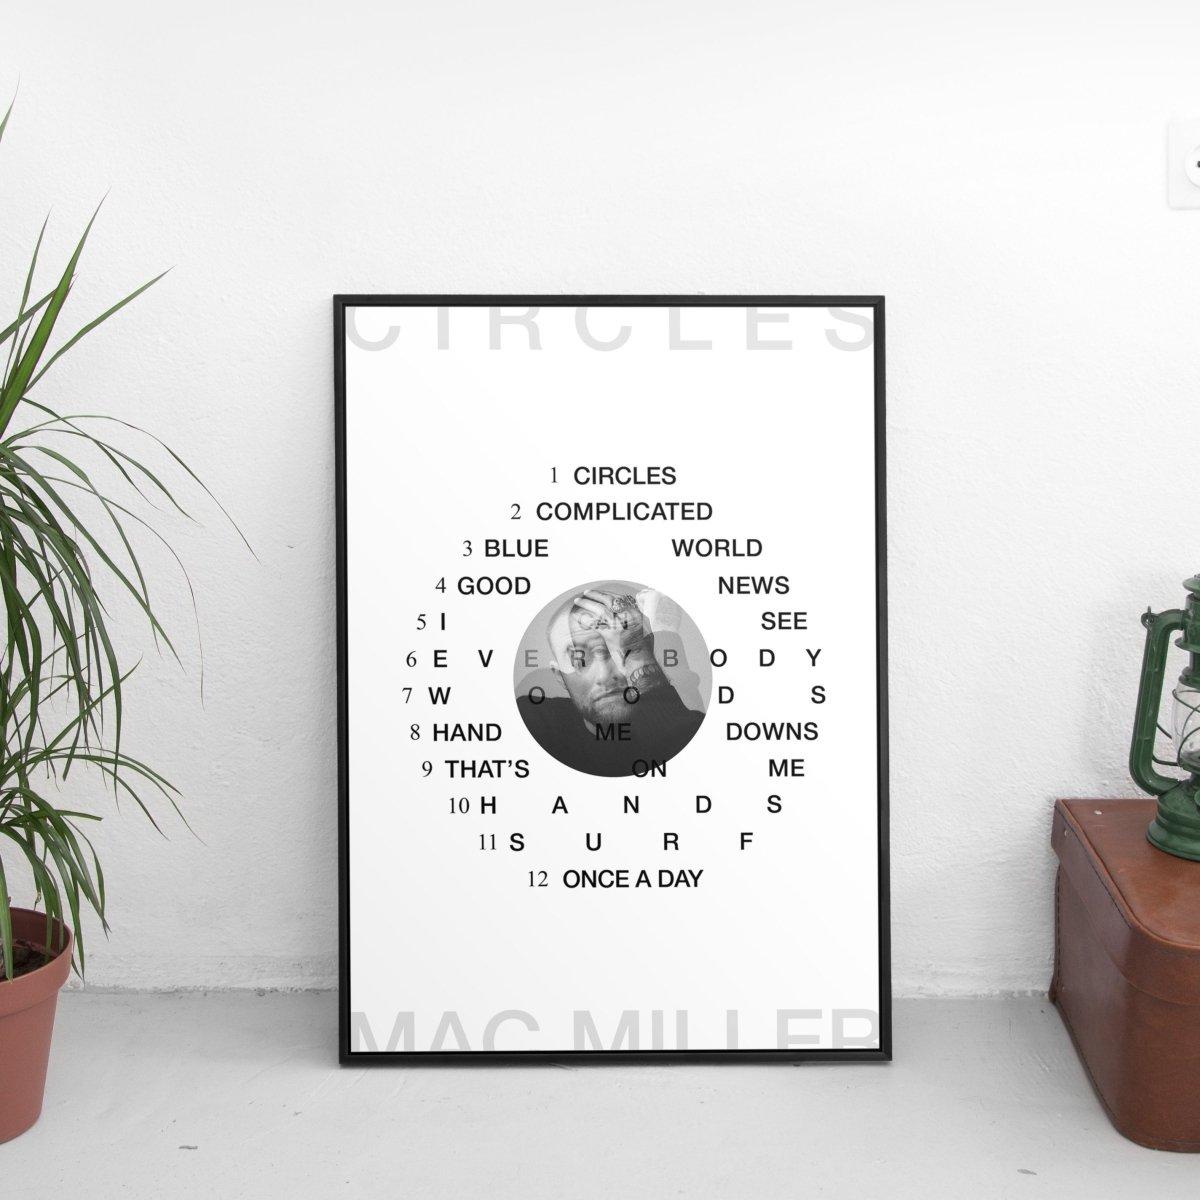 Mac Miller - Circles Tracklist Poster